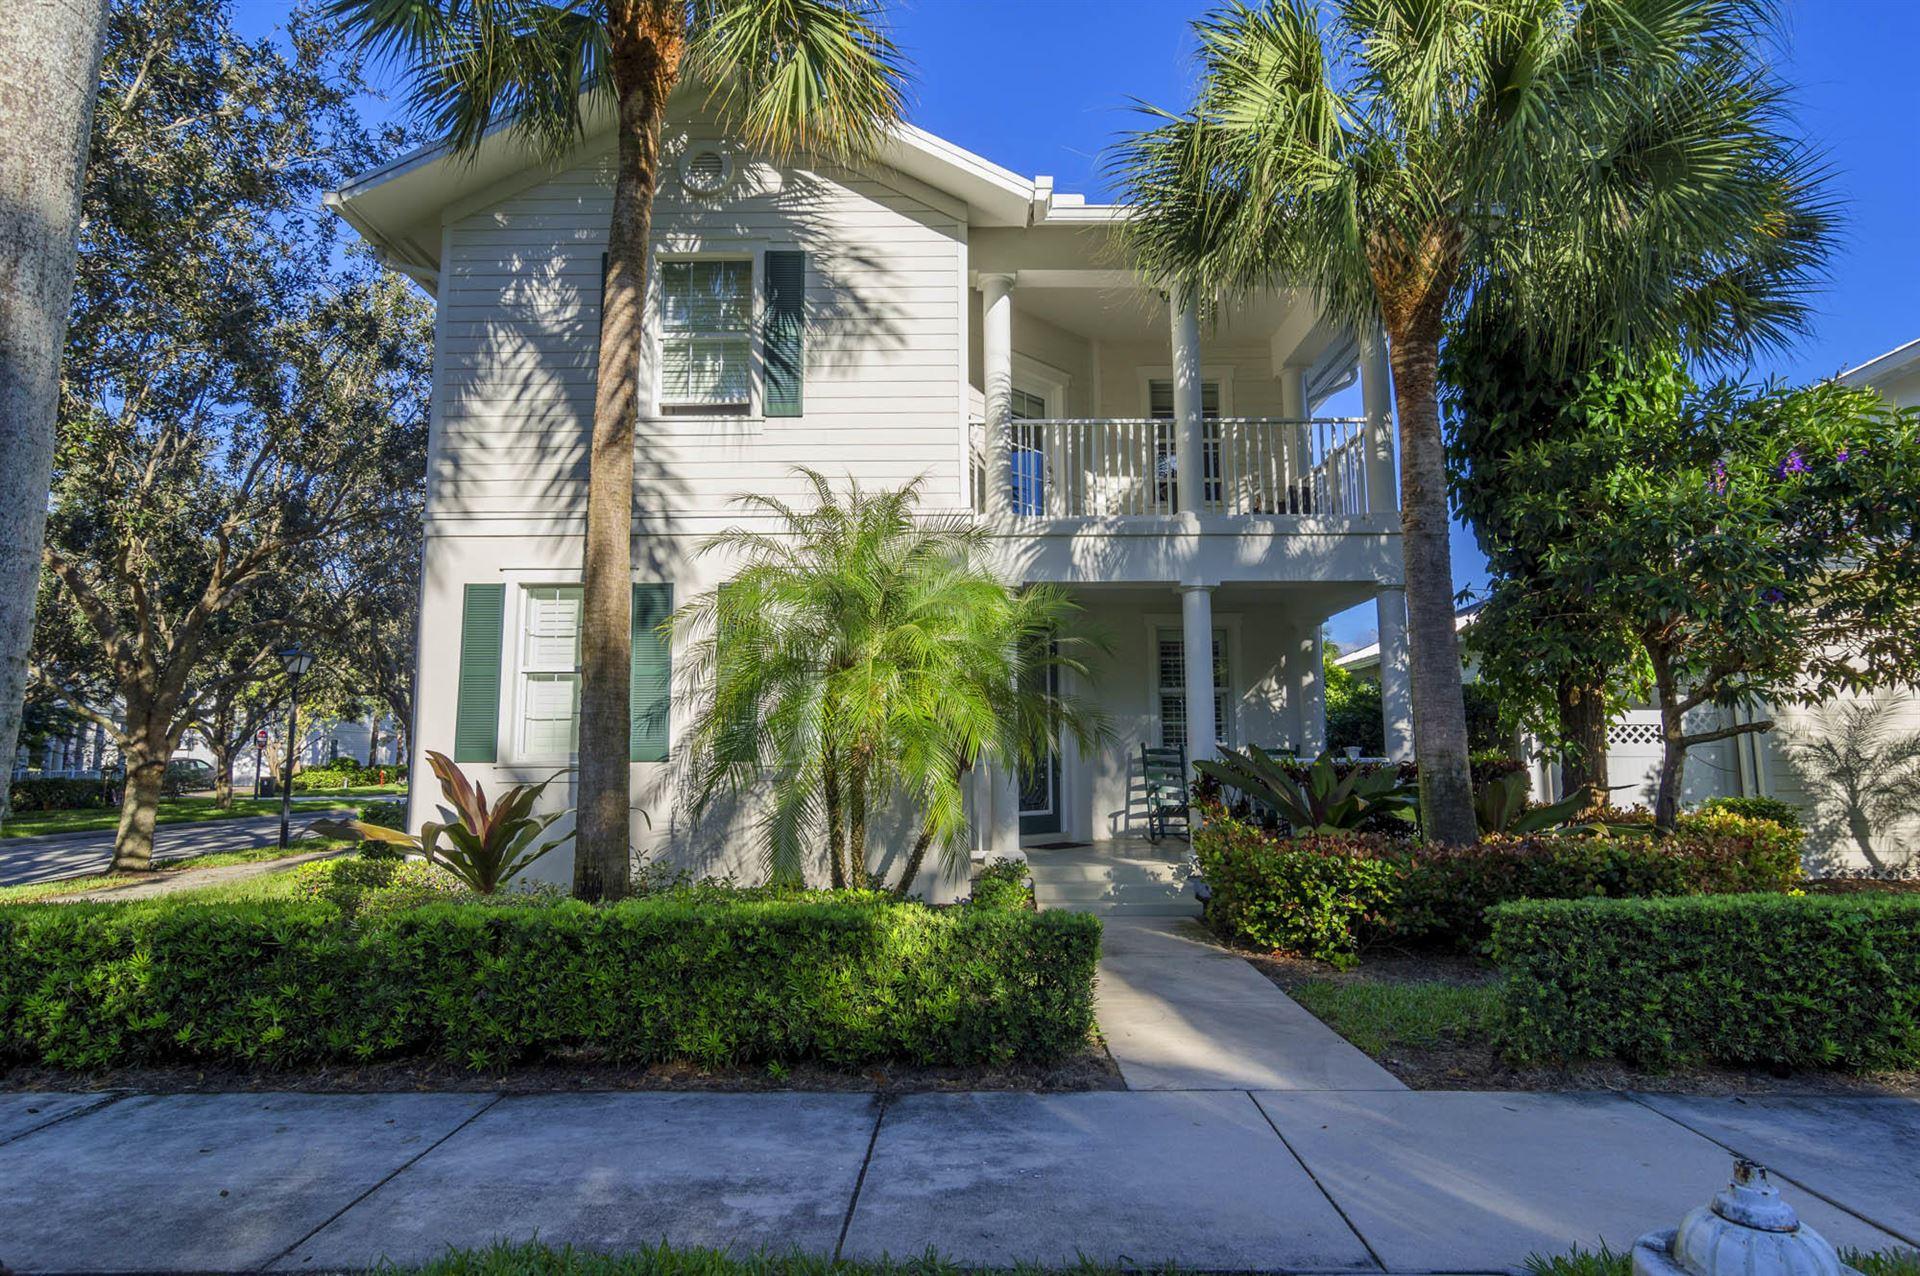 Photo of 3433 Elizabeth Street, Jupiter, FL 33458 (MLS # RX-10675850)